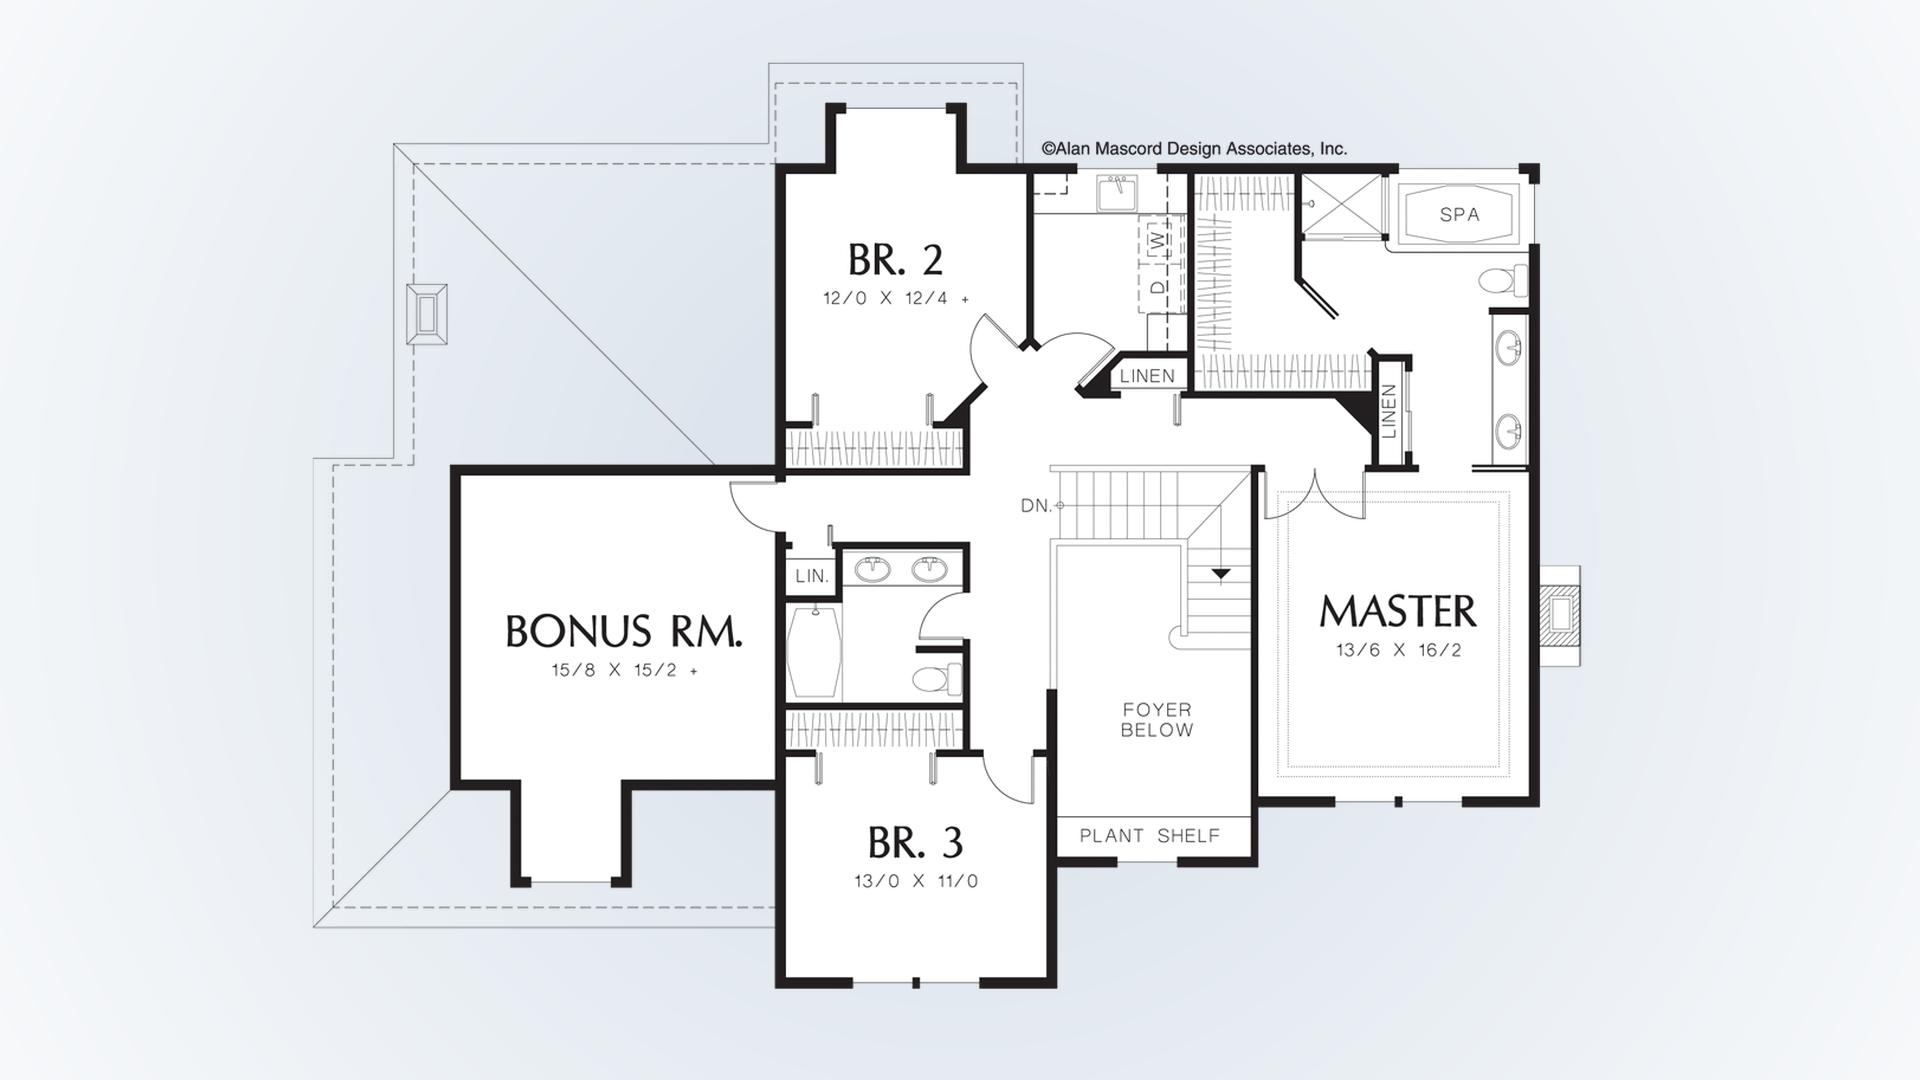 Georgian House Plan 2278 The Bienville: 2870 Sqft, 3 Beds